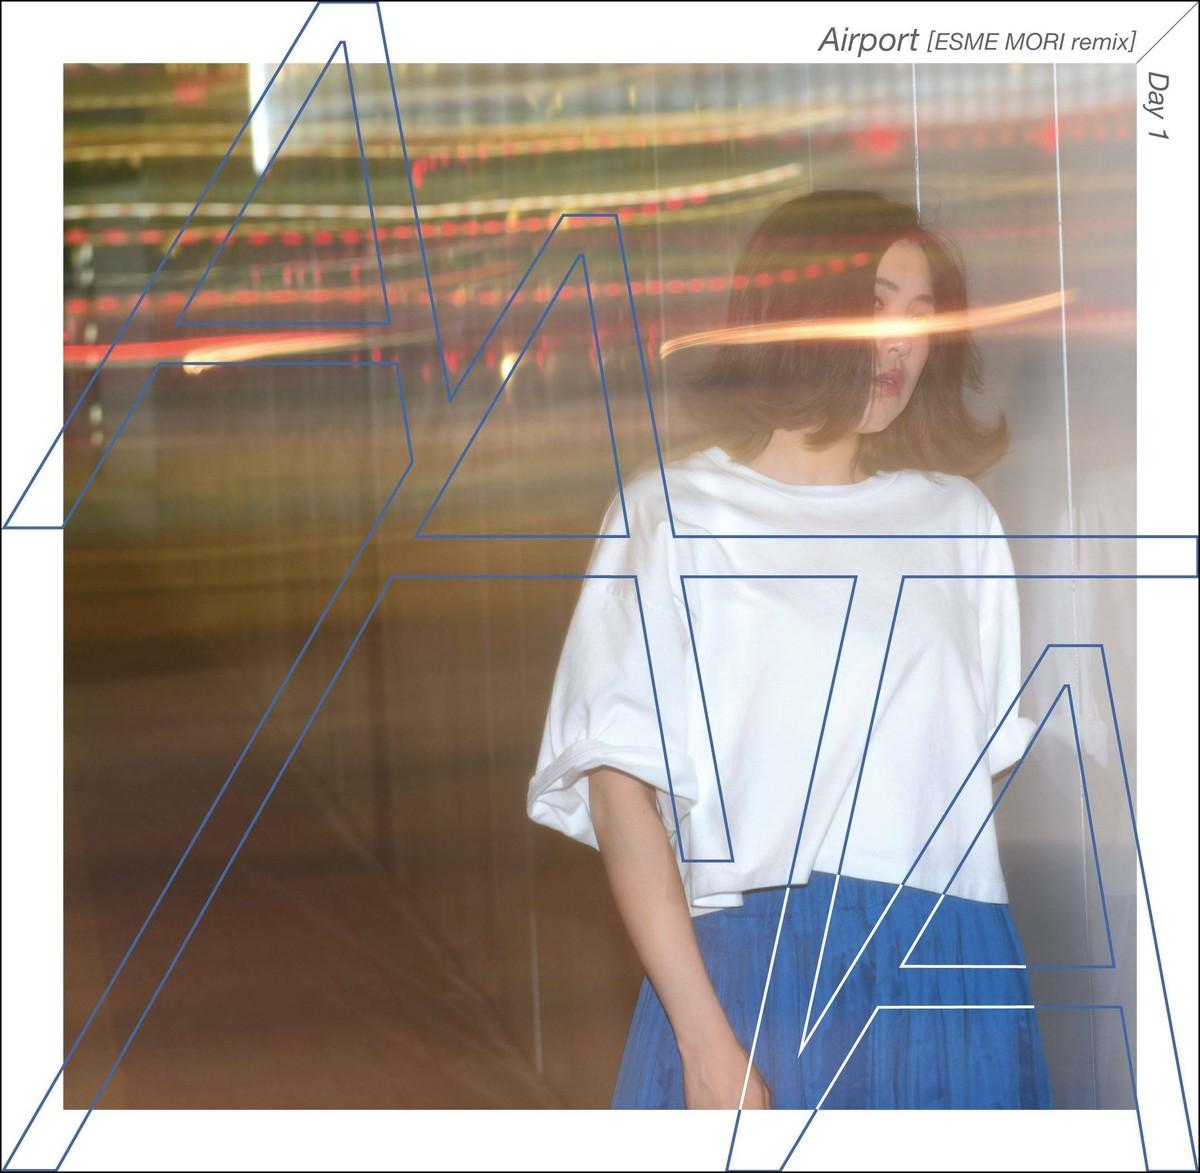 7inch】AATA「Airport (ESME MORI Remix) / Day1」 | AATA / あーた ...